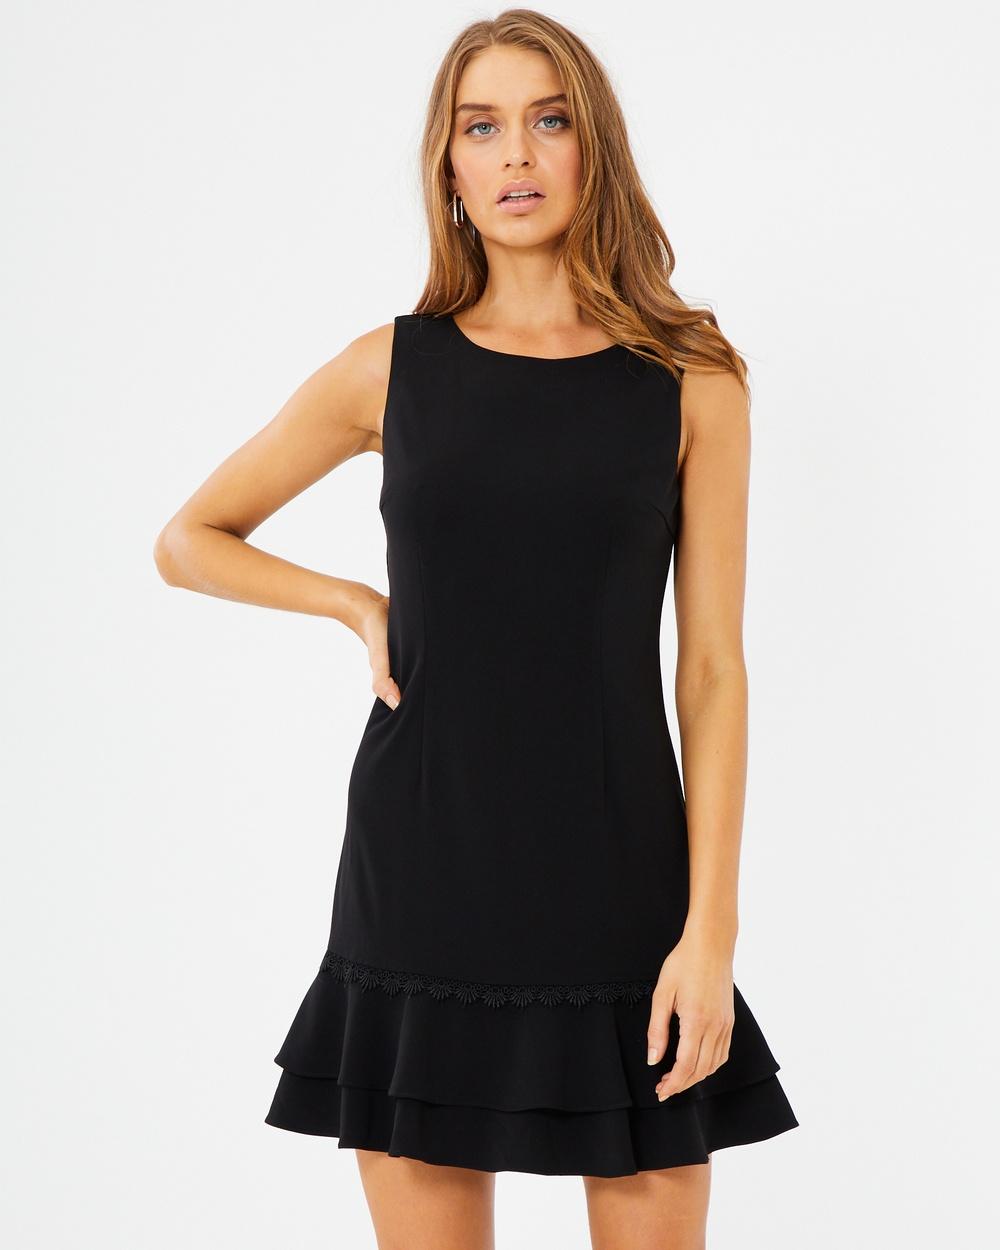 Tussah Marilla Shift Dress Dresses Black Marilla Shift Dress